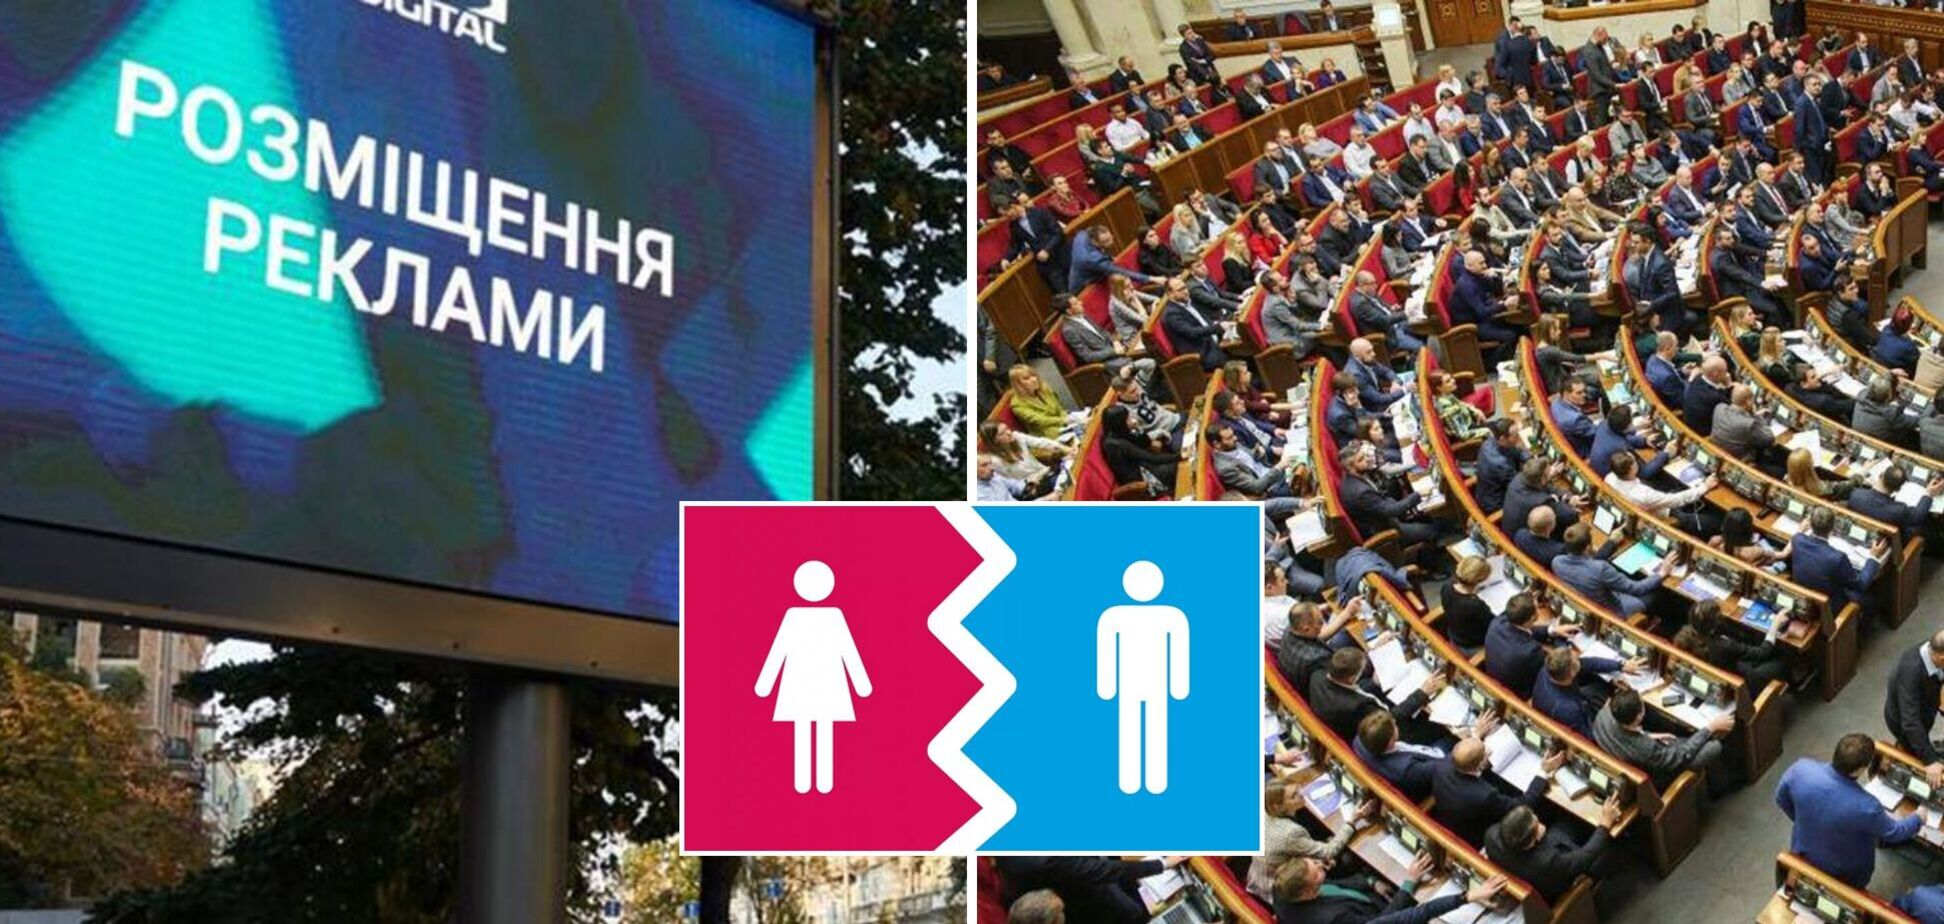 Сексистську рекламу заборонять законодавчо